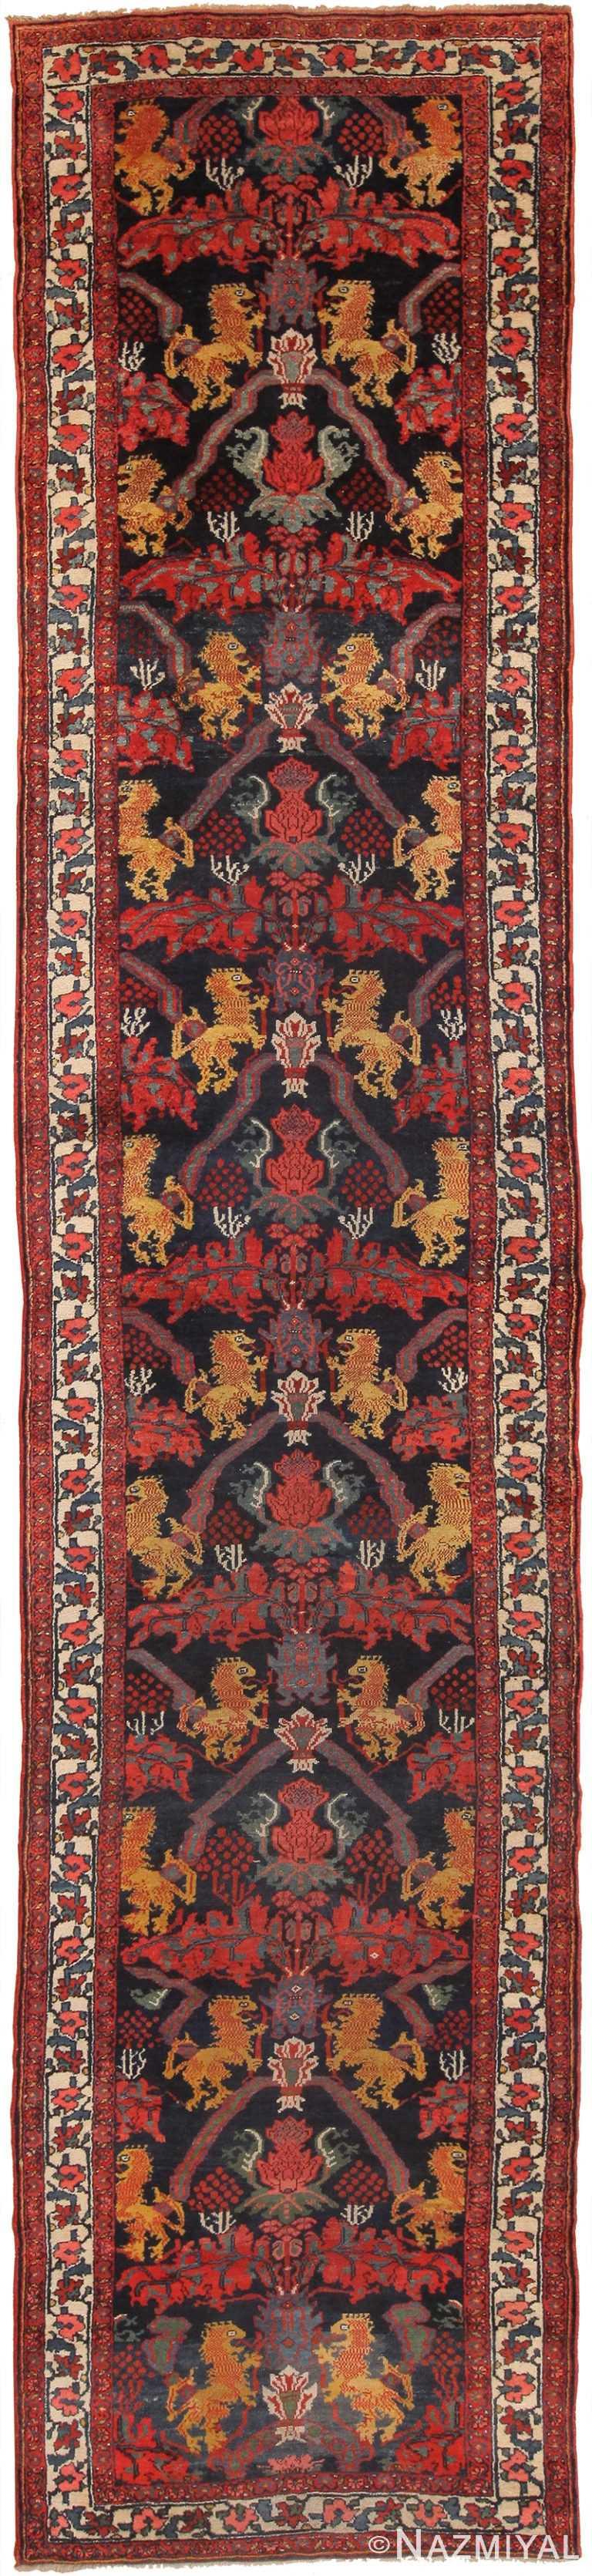 Antique Persian Kurdish Bidjar Runner Rug 70310 by Nazmiyal NYC